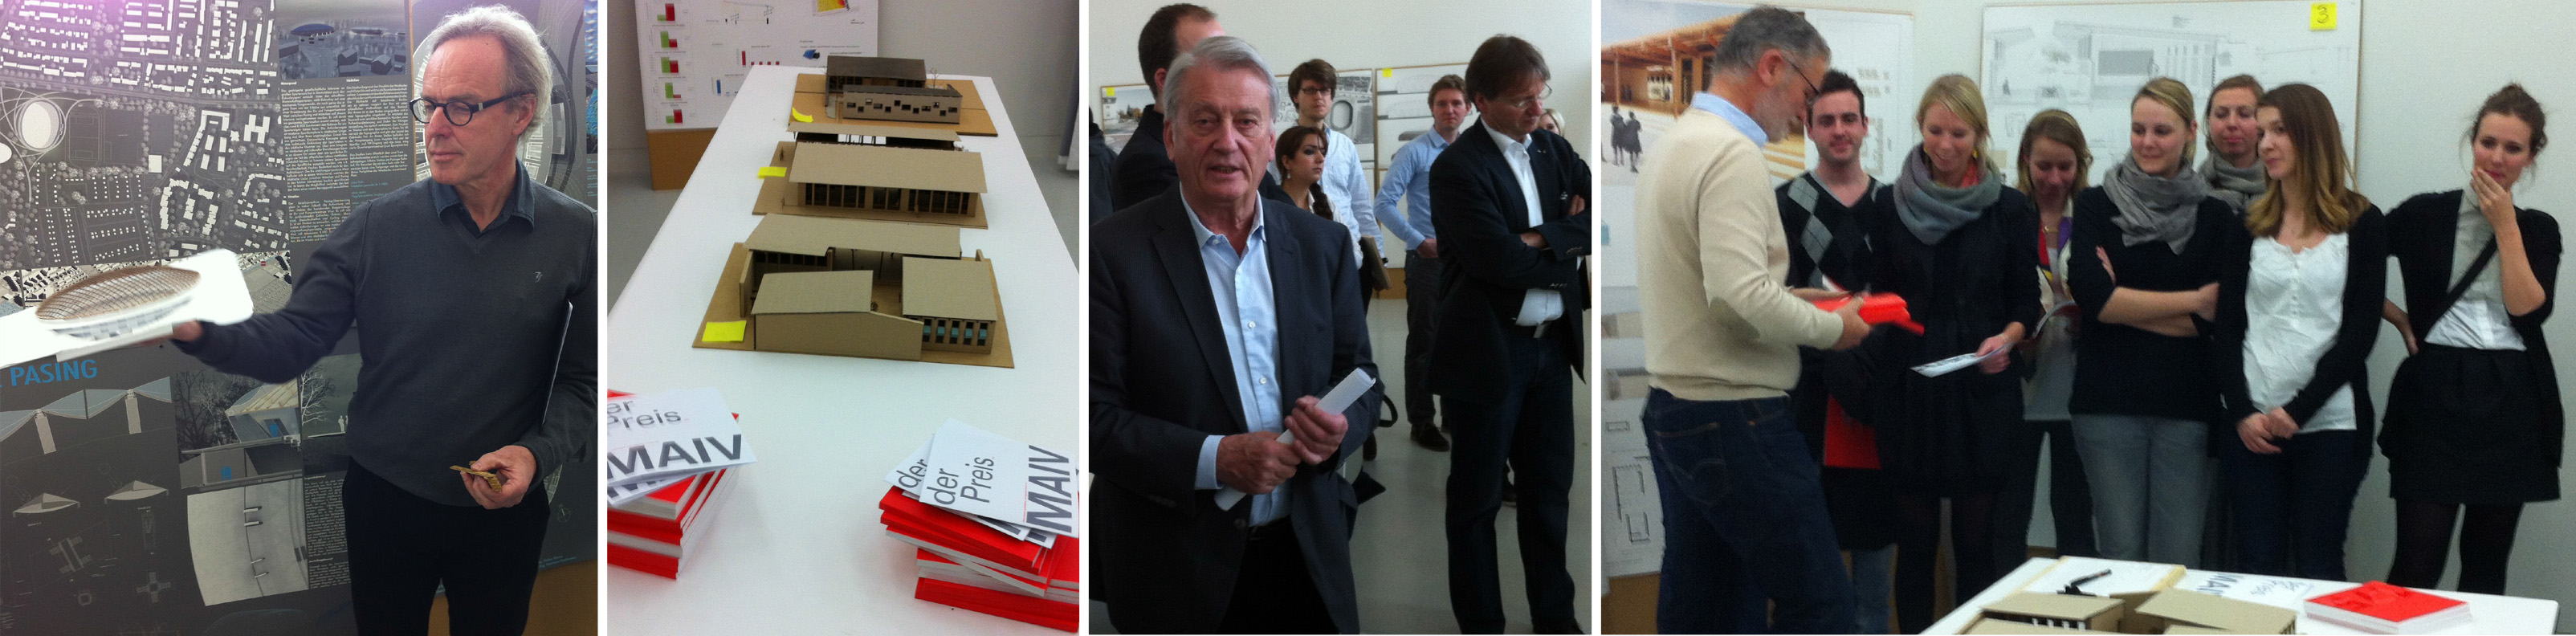 http://aiv-muenchen.de/maiv/images/Header/Fotostreifen_MAIV-Preis 2013.jpg